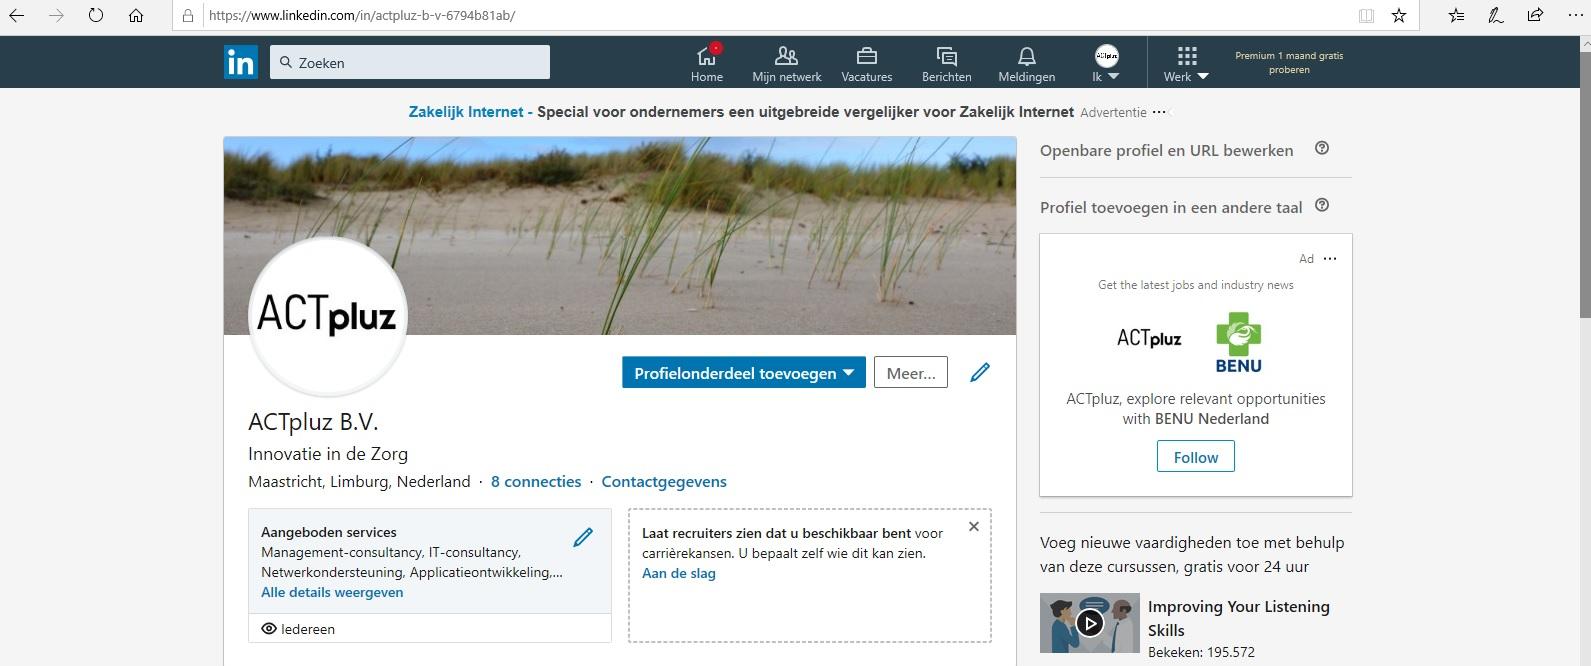 ACTpluz at LinkedIn